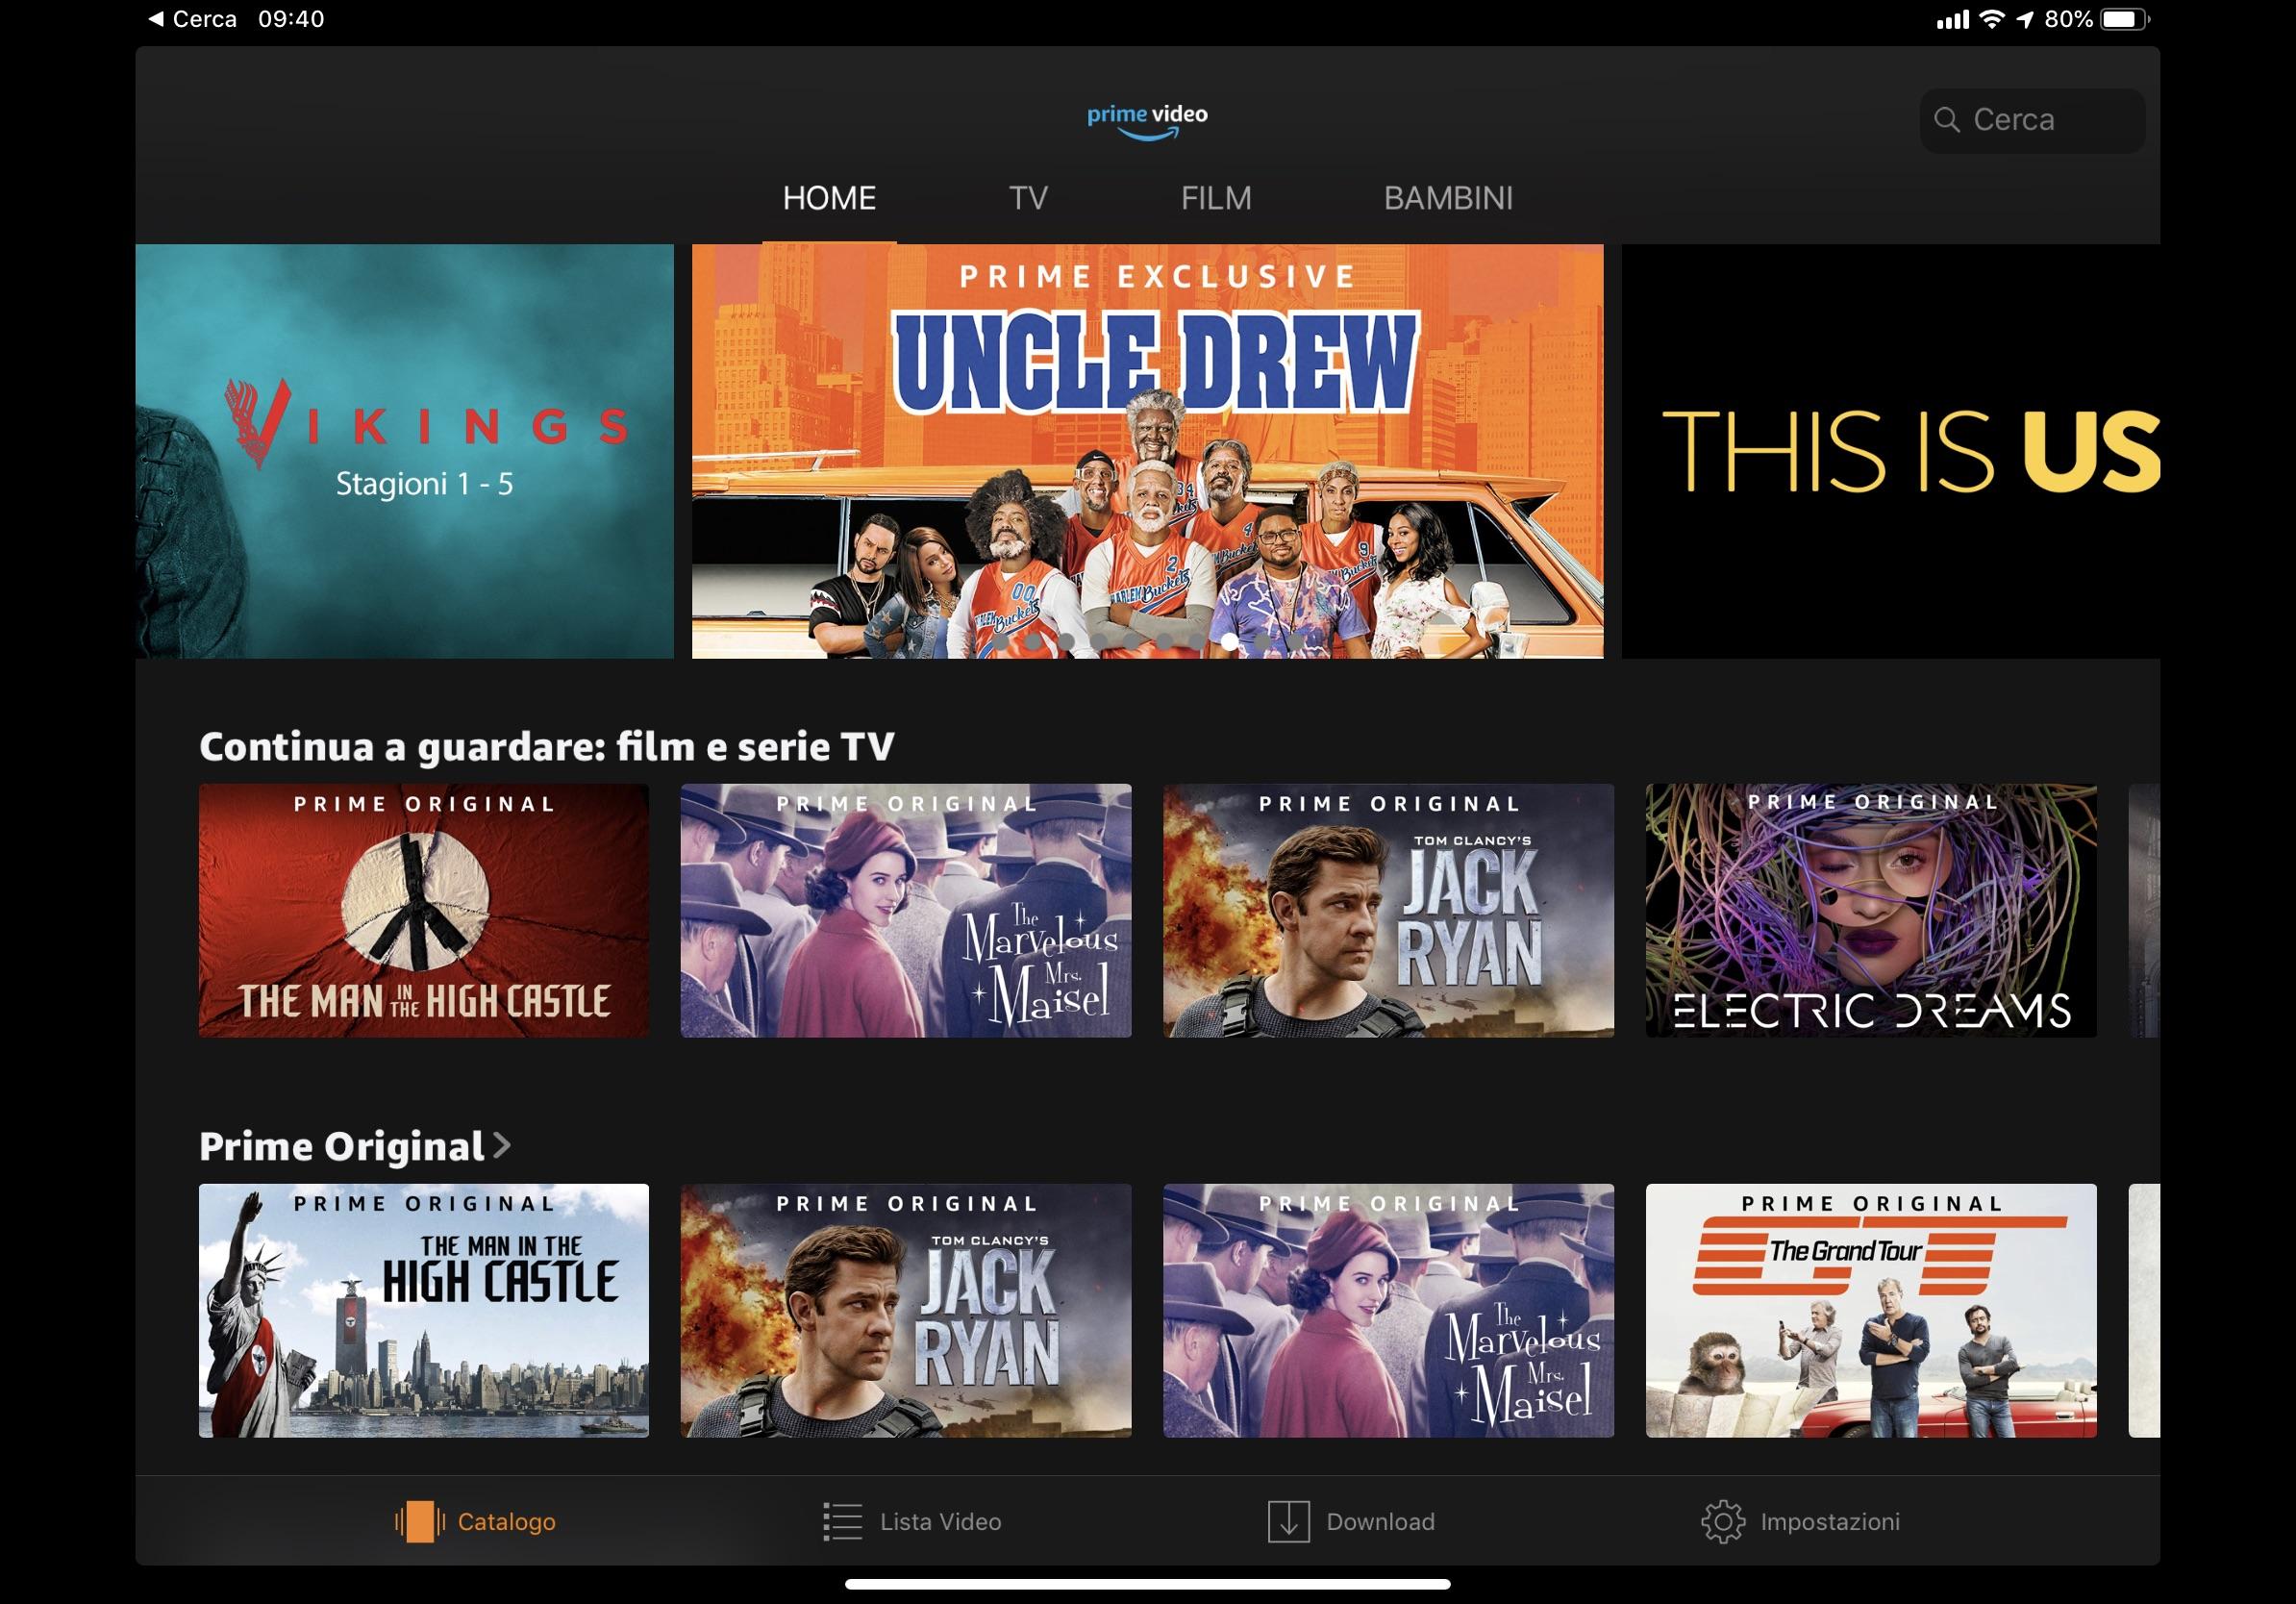 iPad Pro Netflix, Prime Video, etc  | MacRumors Forums